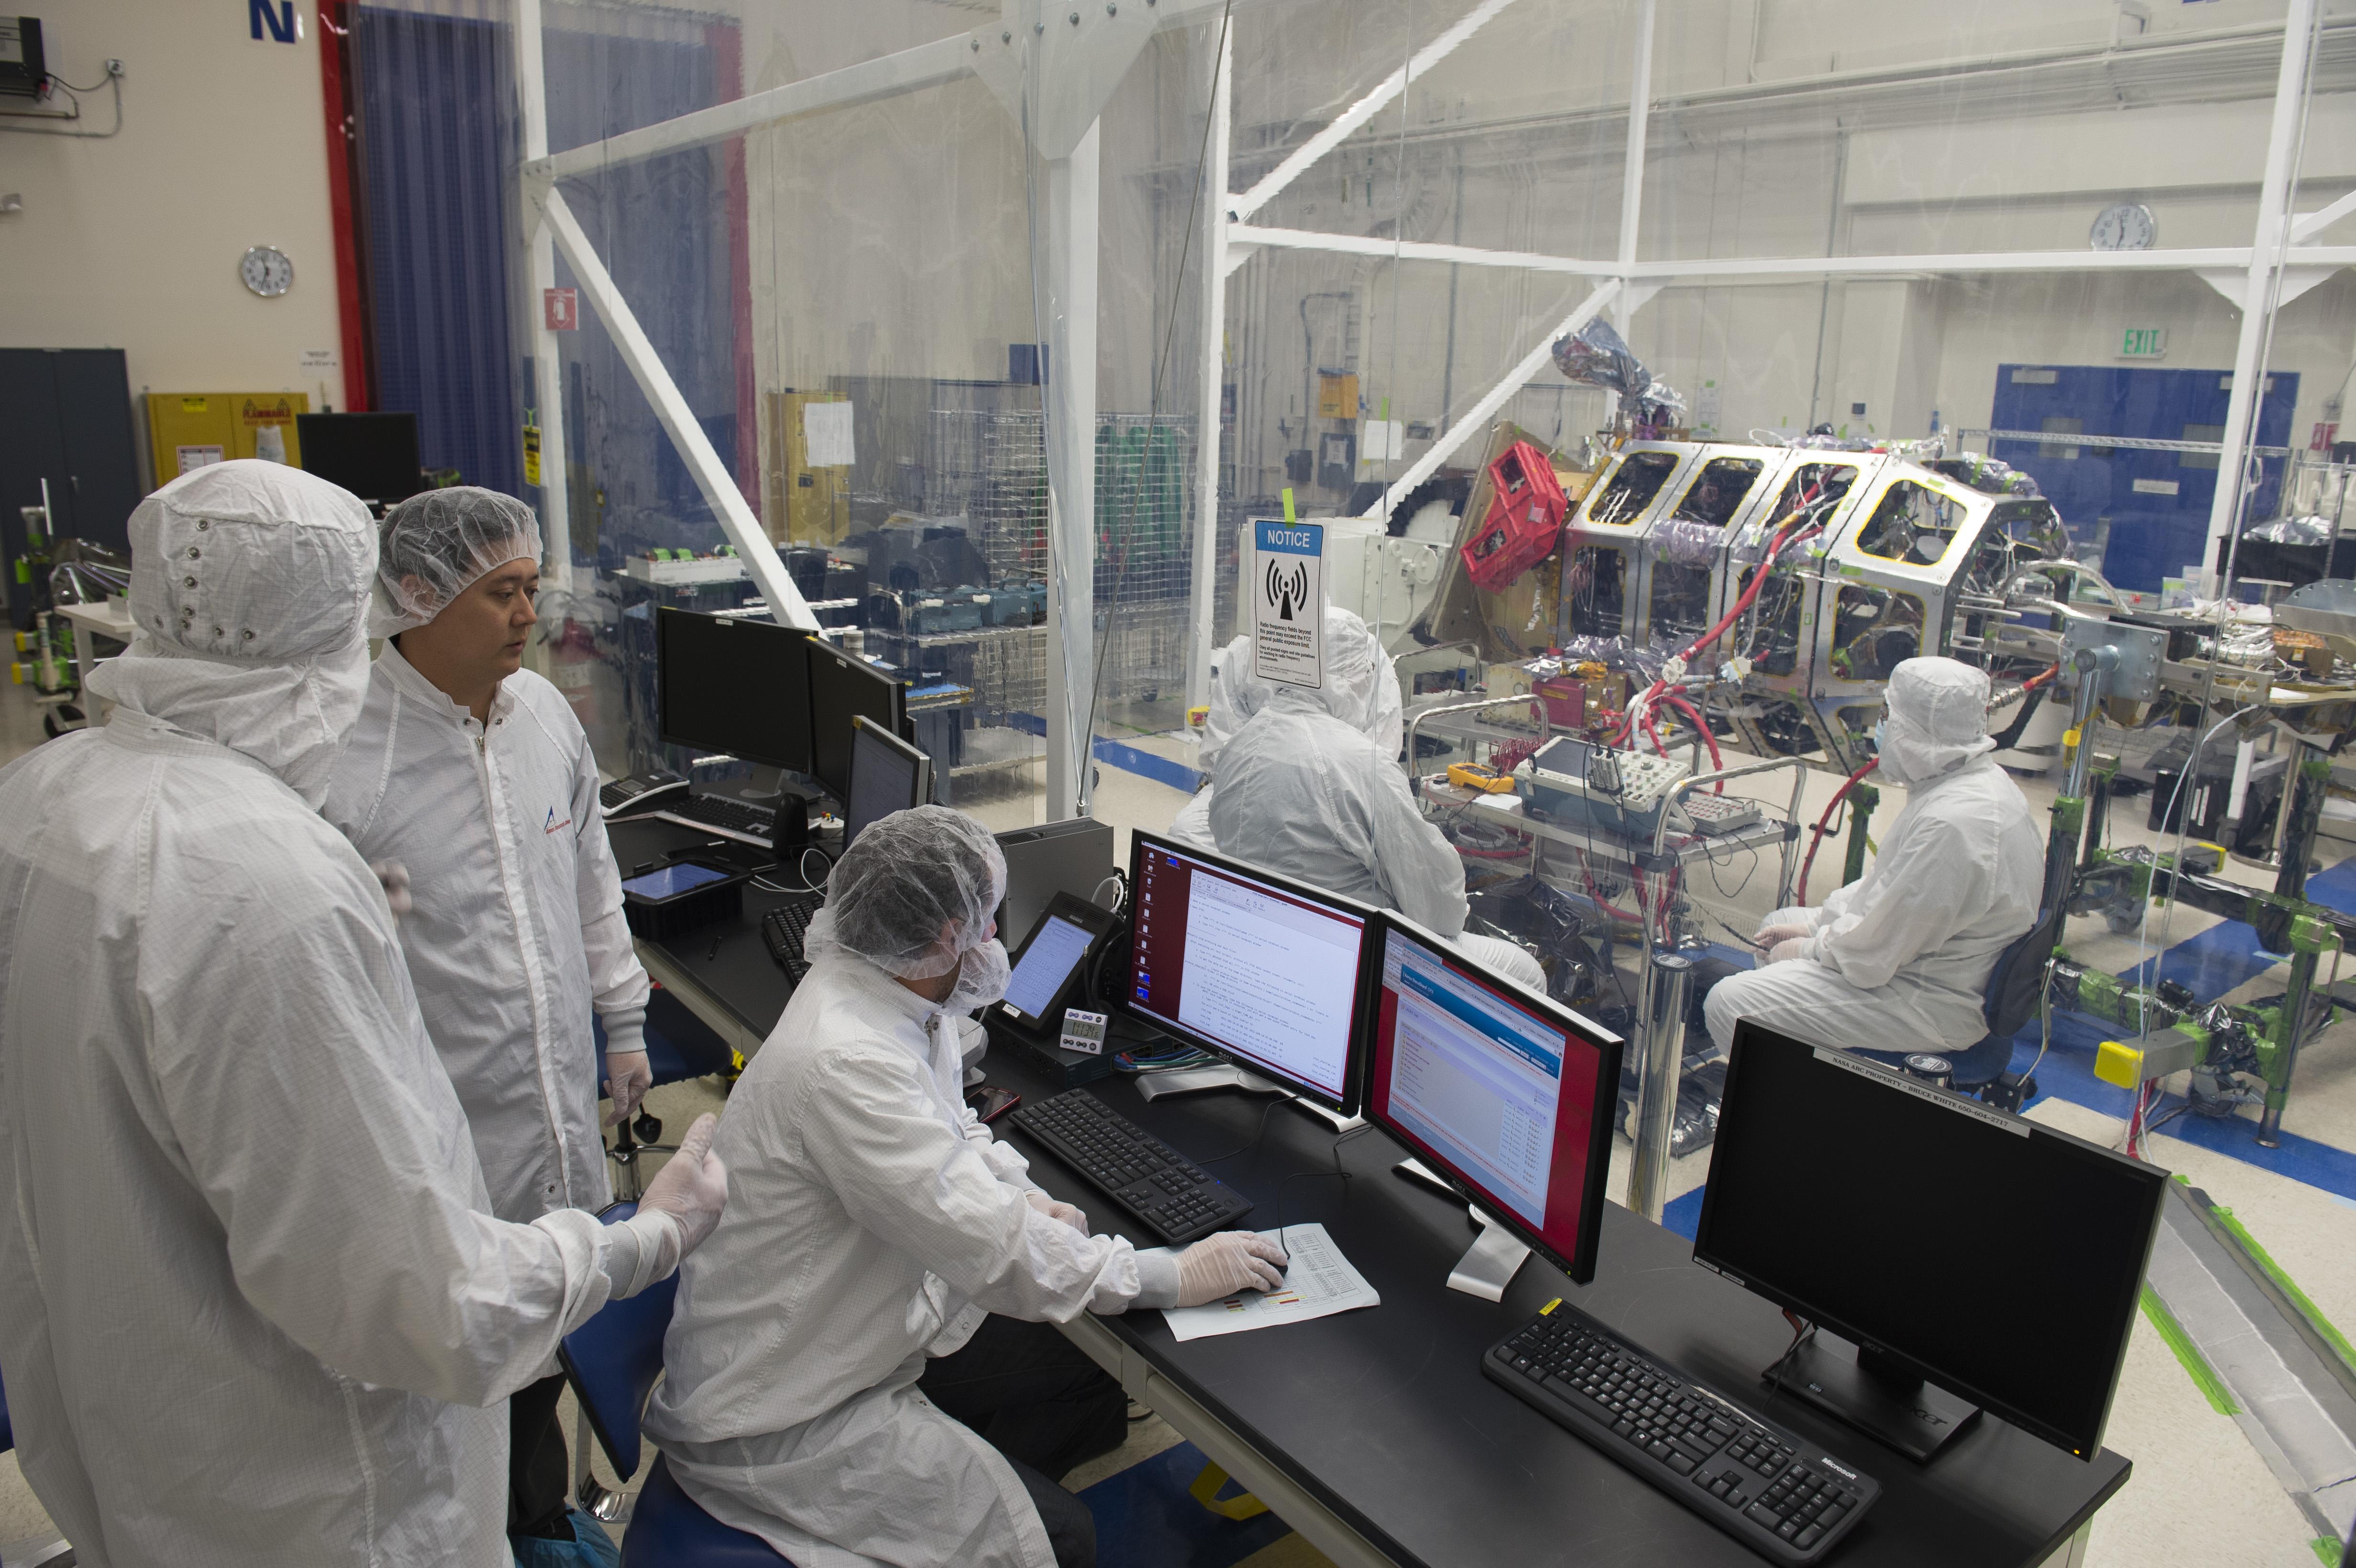 nasa space research - photo #10